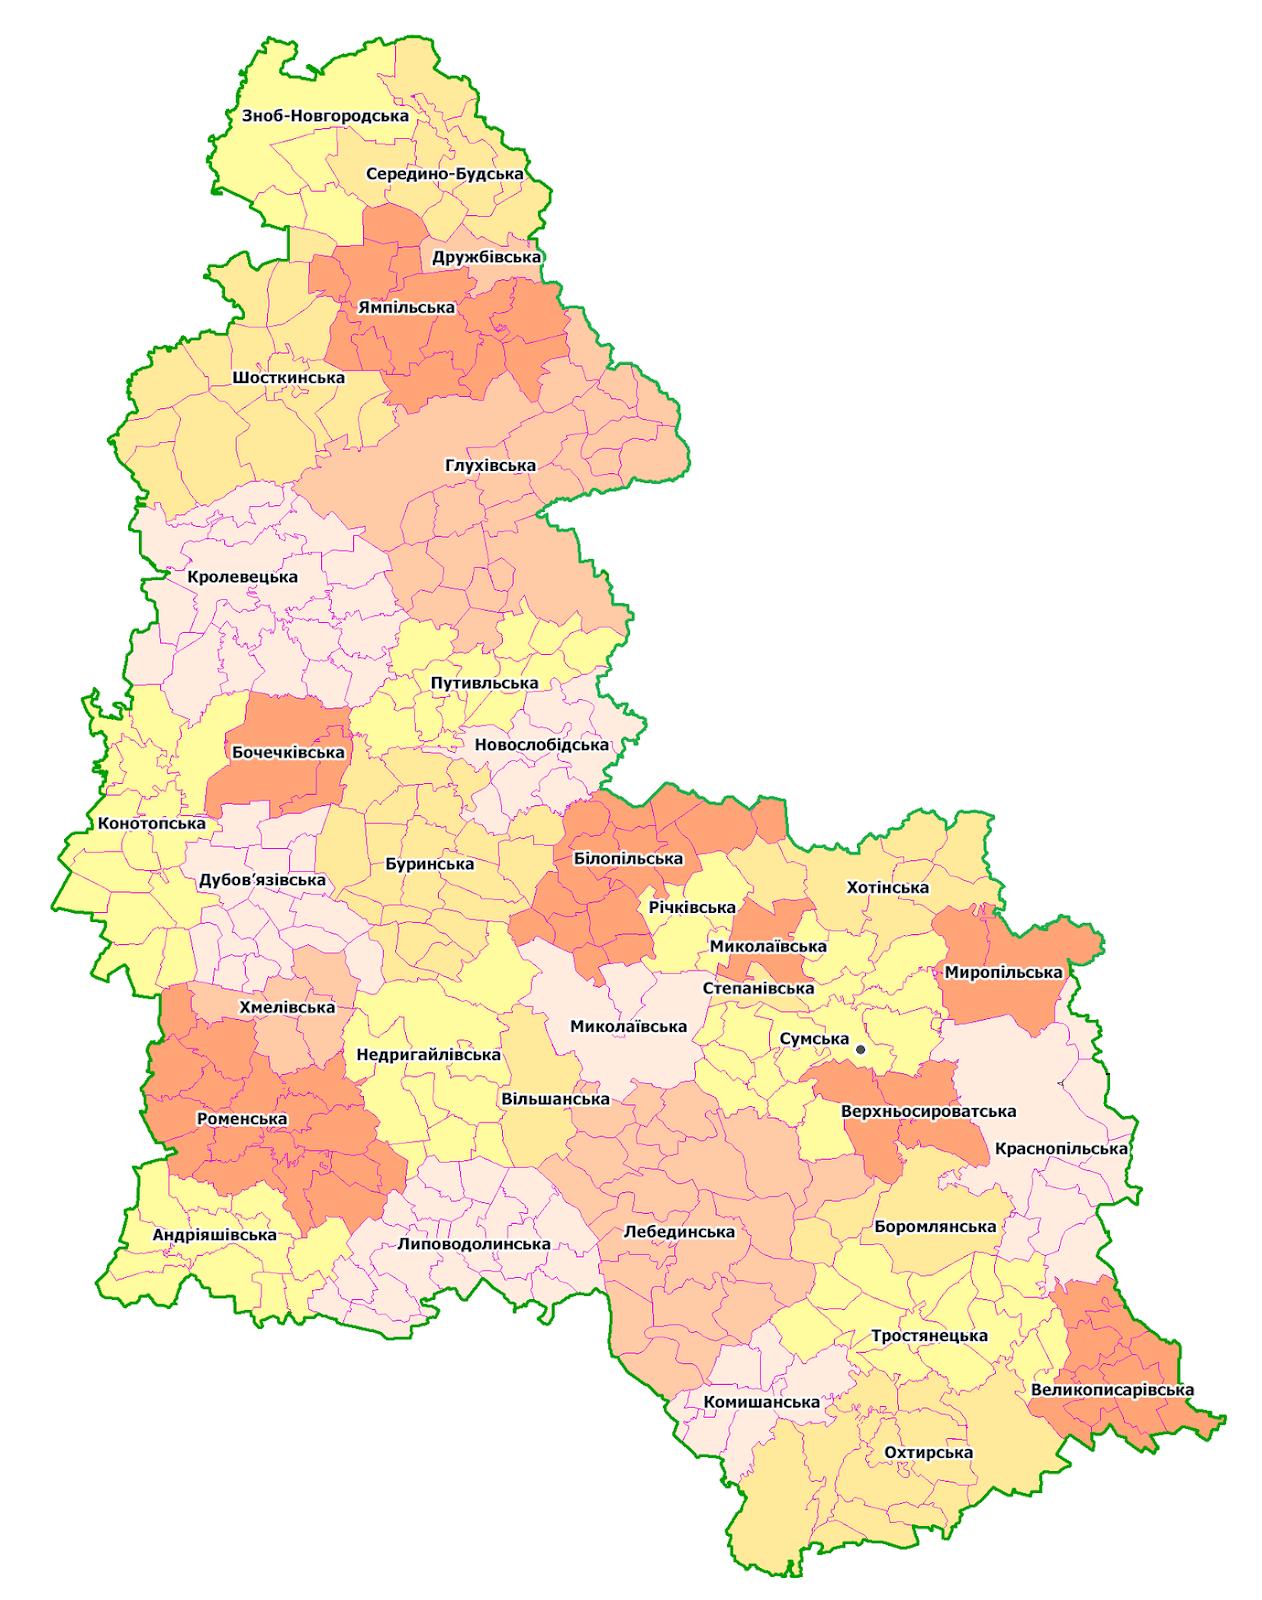 sumy oblast map 2020